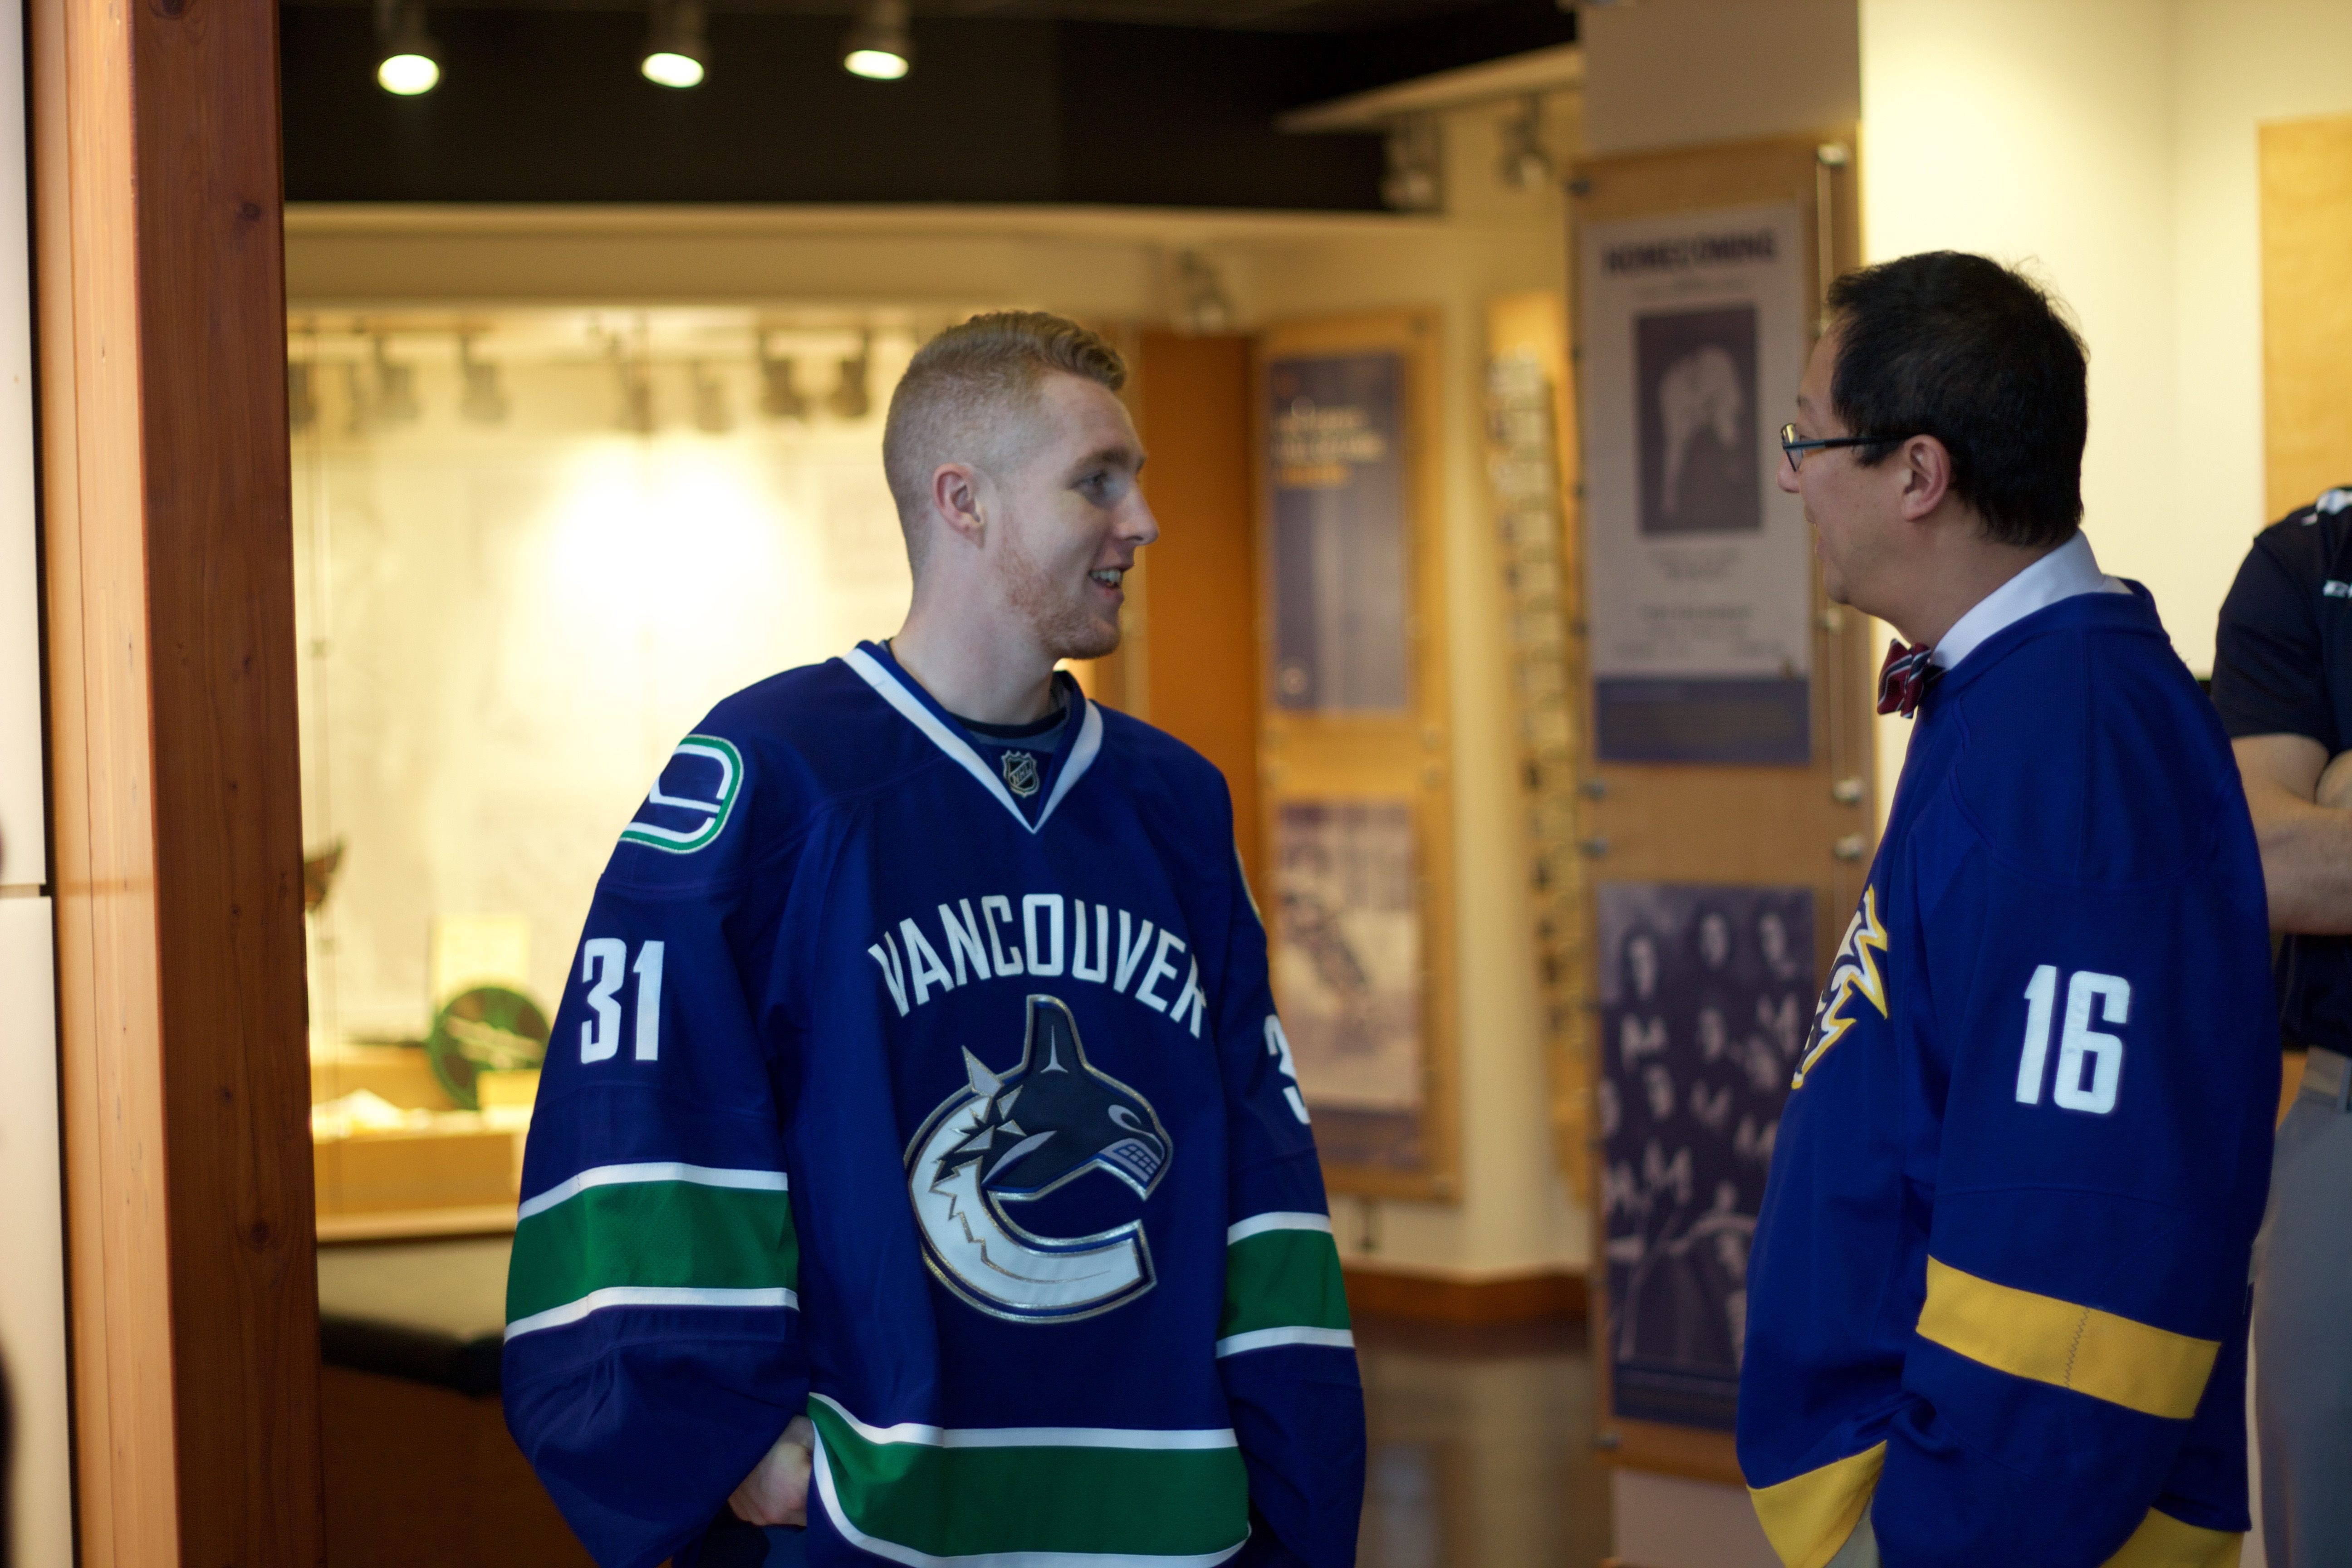 UBC goaltender Matt Hewitt and UBC President Santa Ono